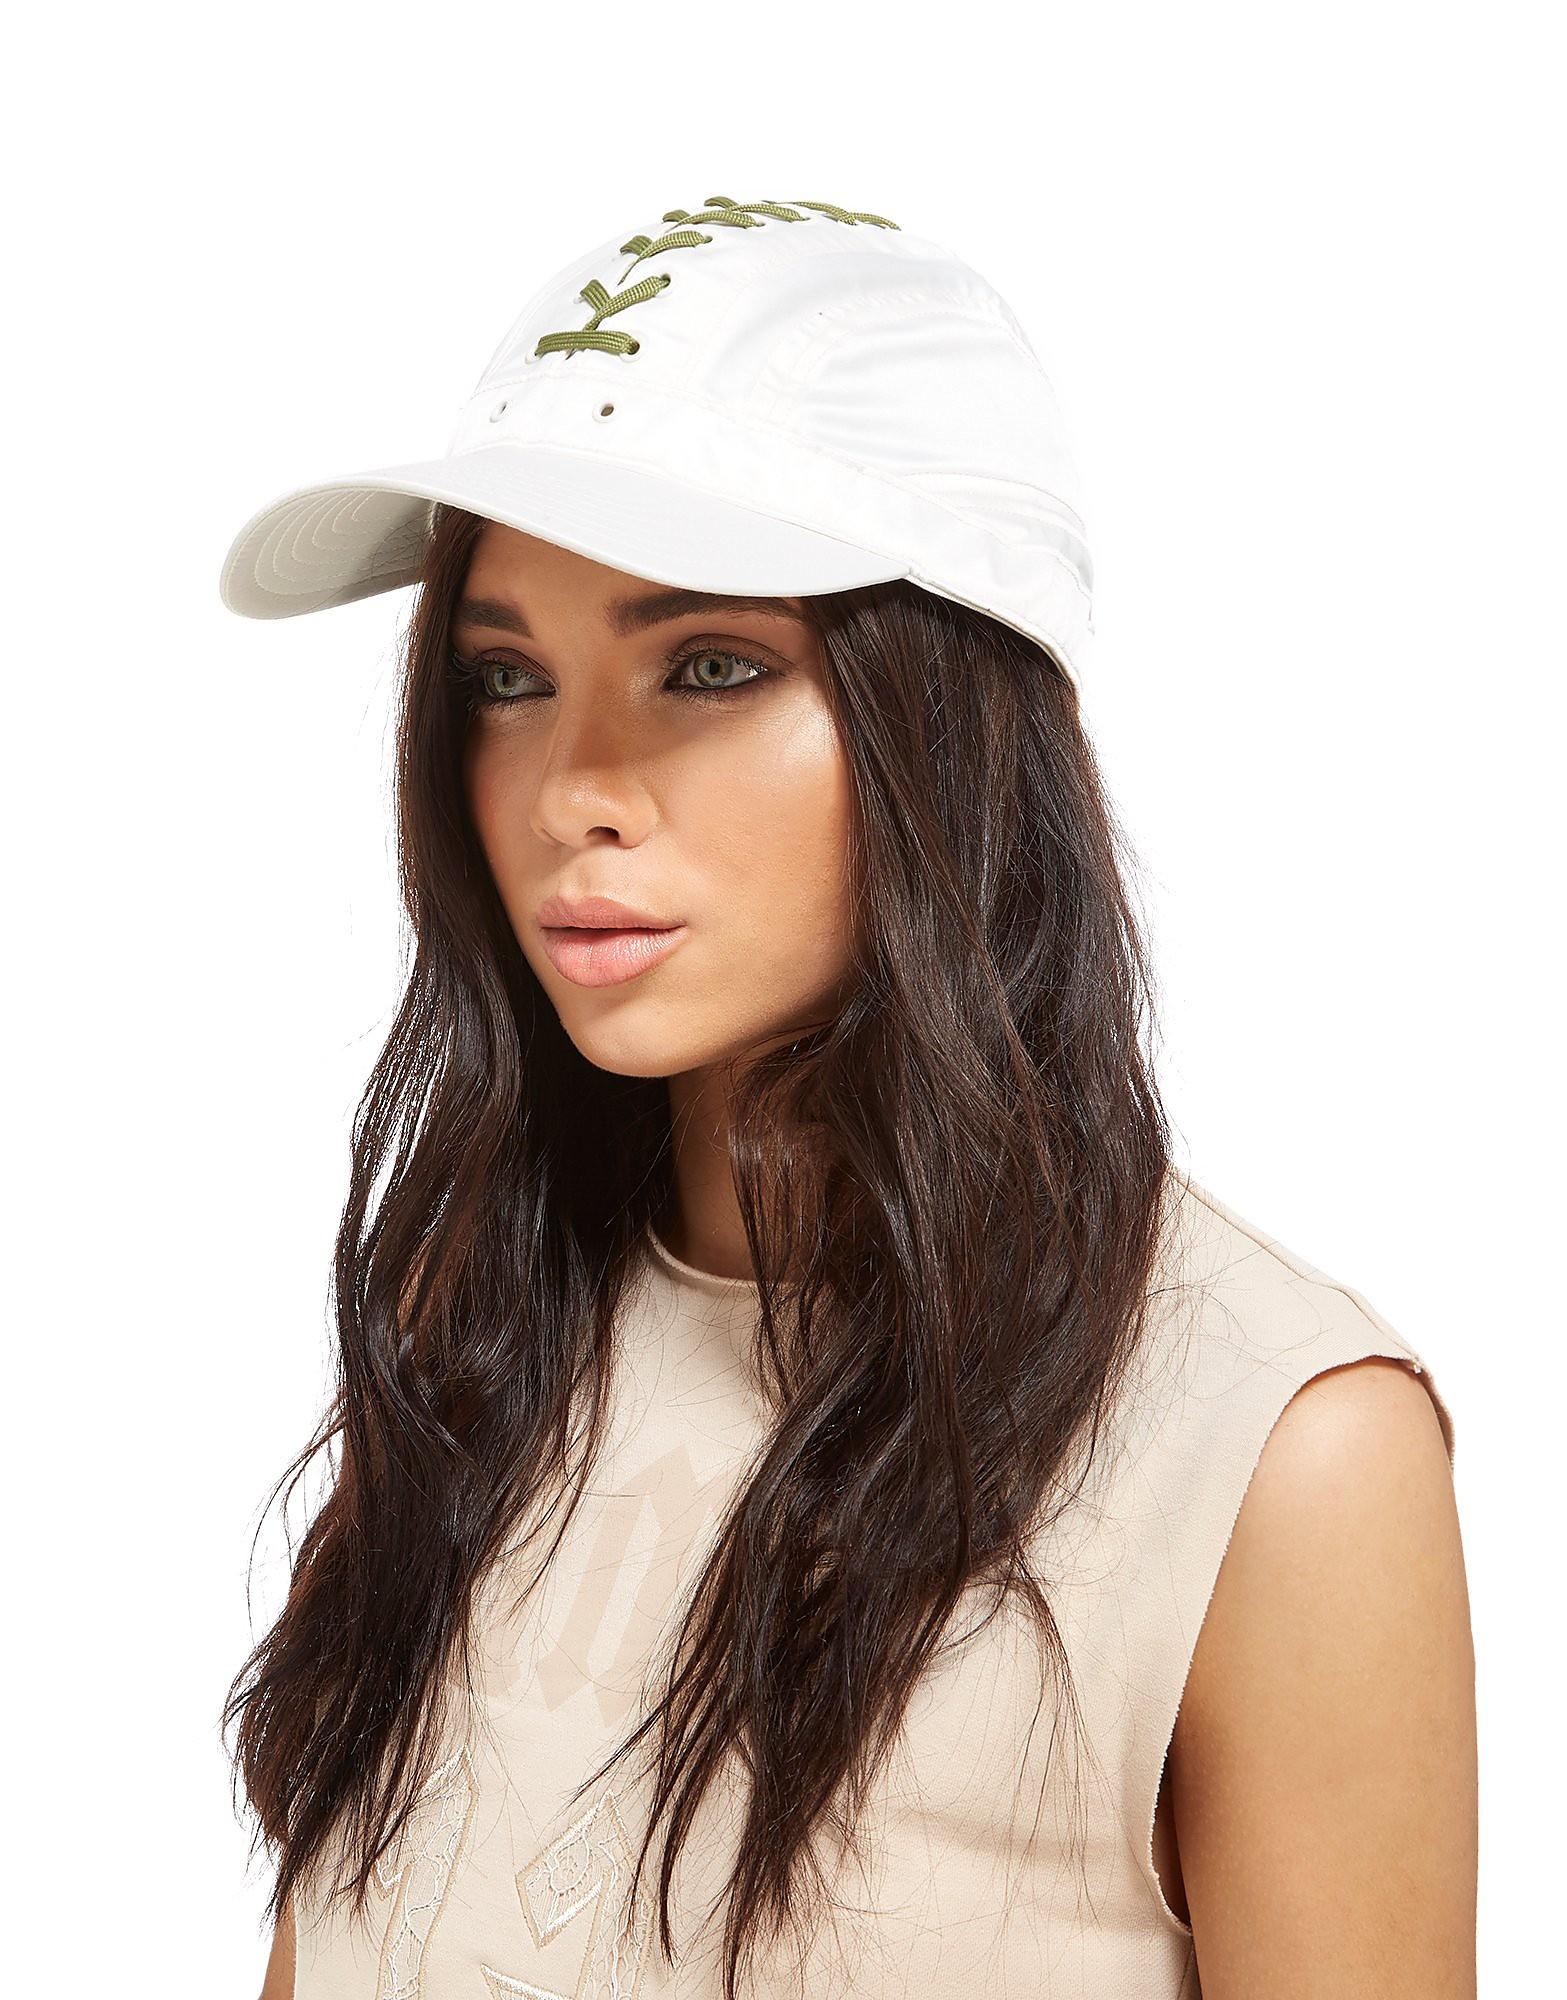 PUMA Fenty Lace Cap